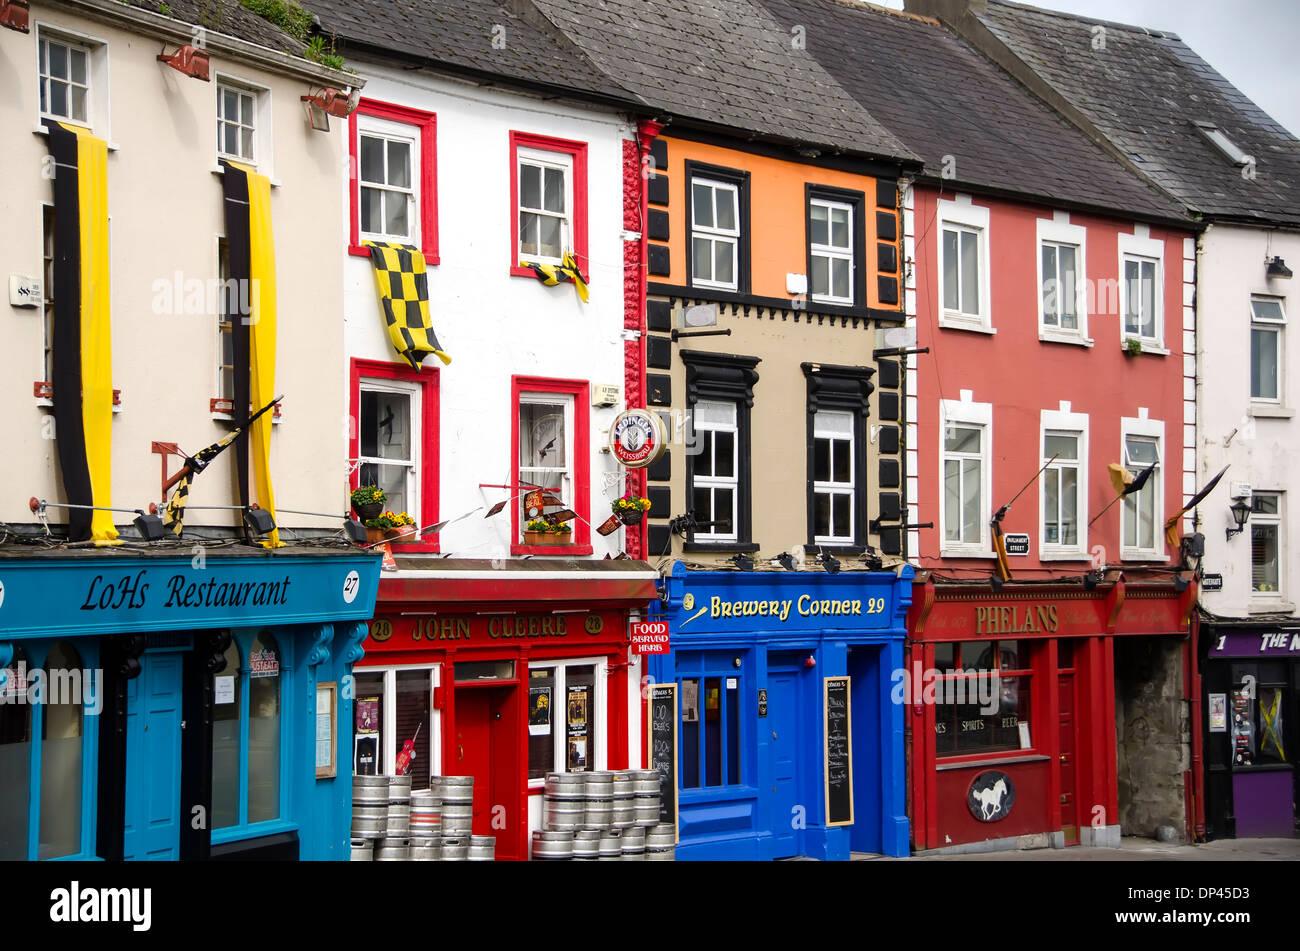 Straßenbild bunte Architektur Gebäude Parliament Street, Stadt Kilkenny, Irland Stockbild